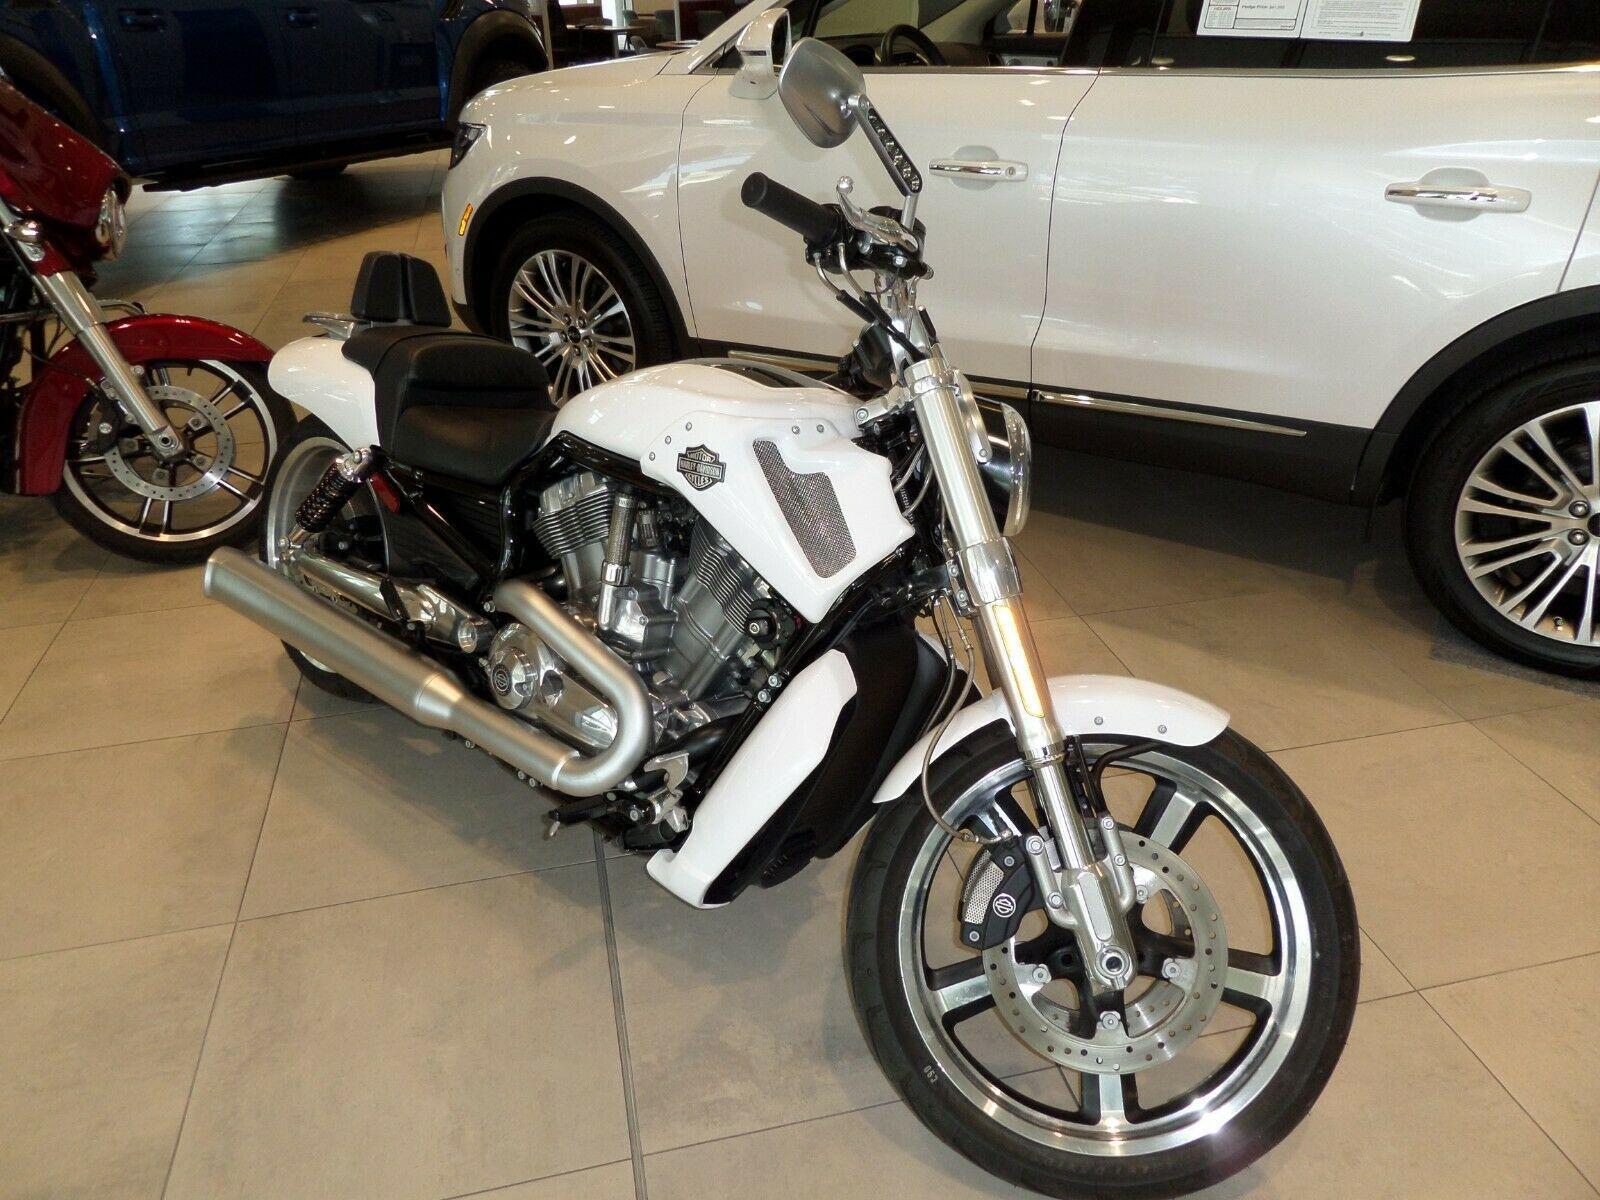 2016 Harley Davidson V Rod Harley Davidson V Rod Muscle Harley Davidson V Rod Harley Davidson V Rod